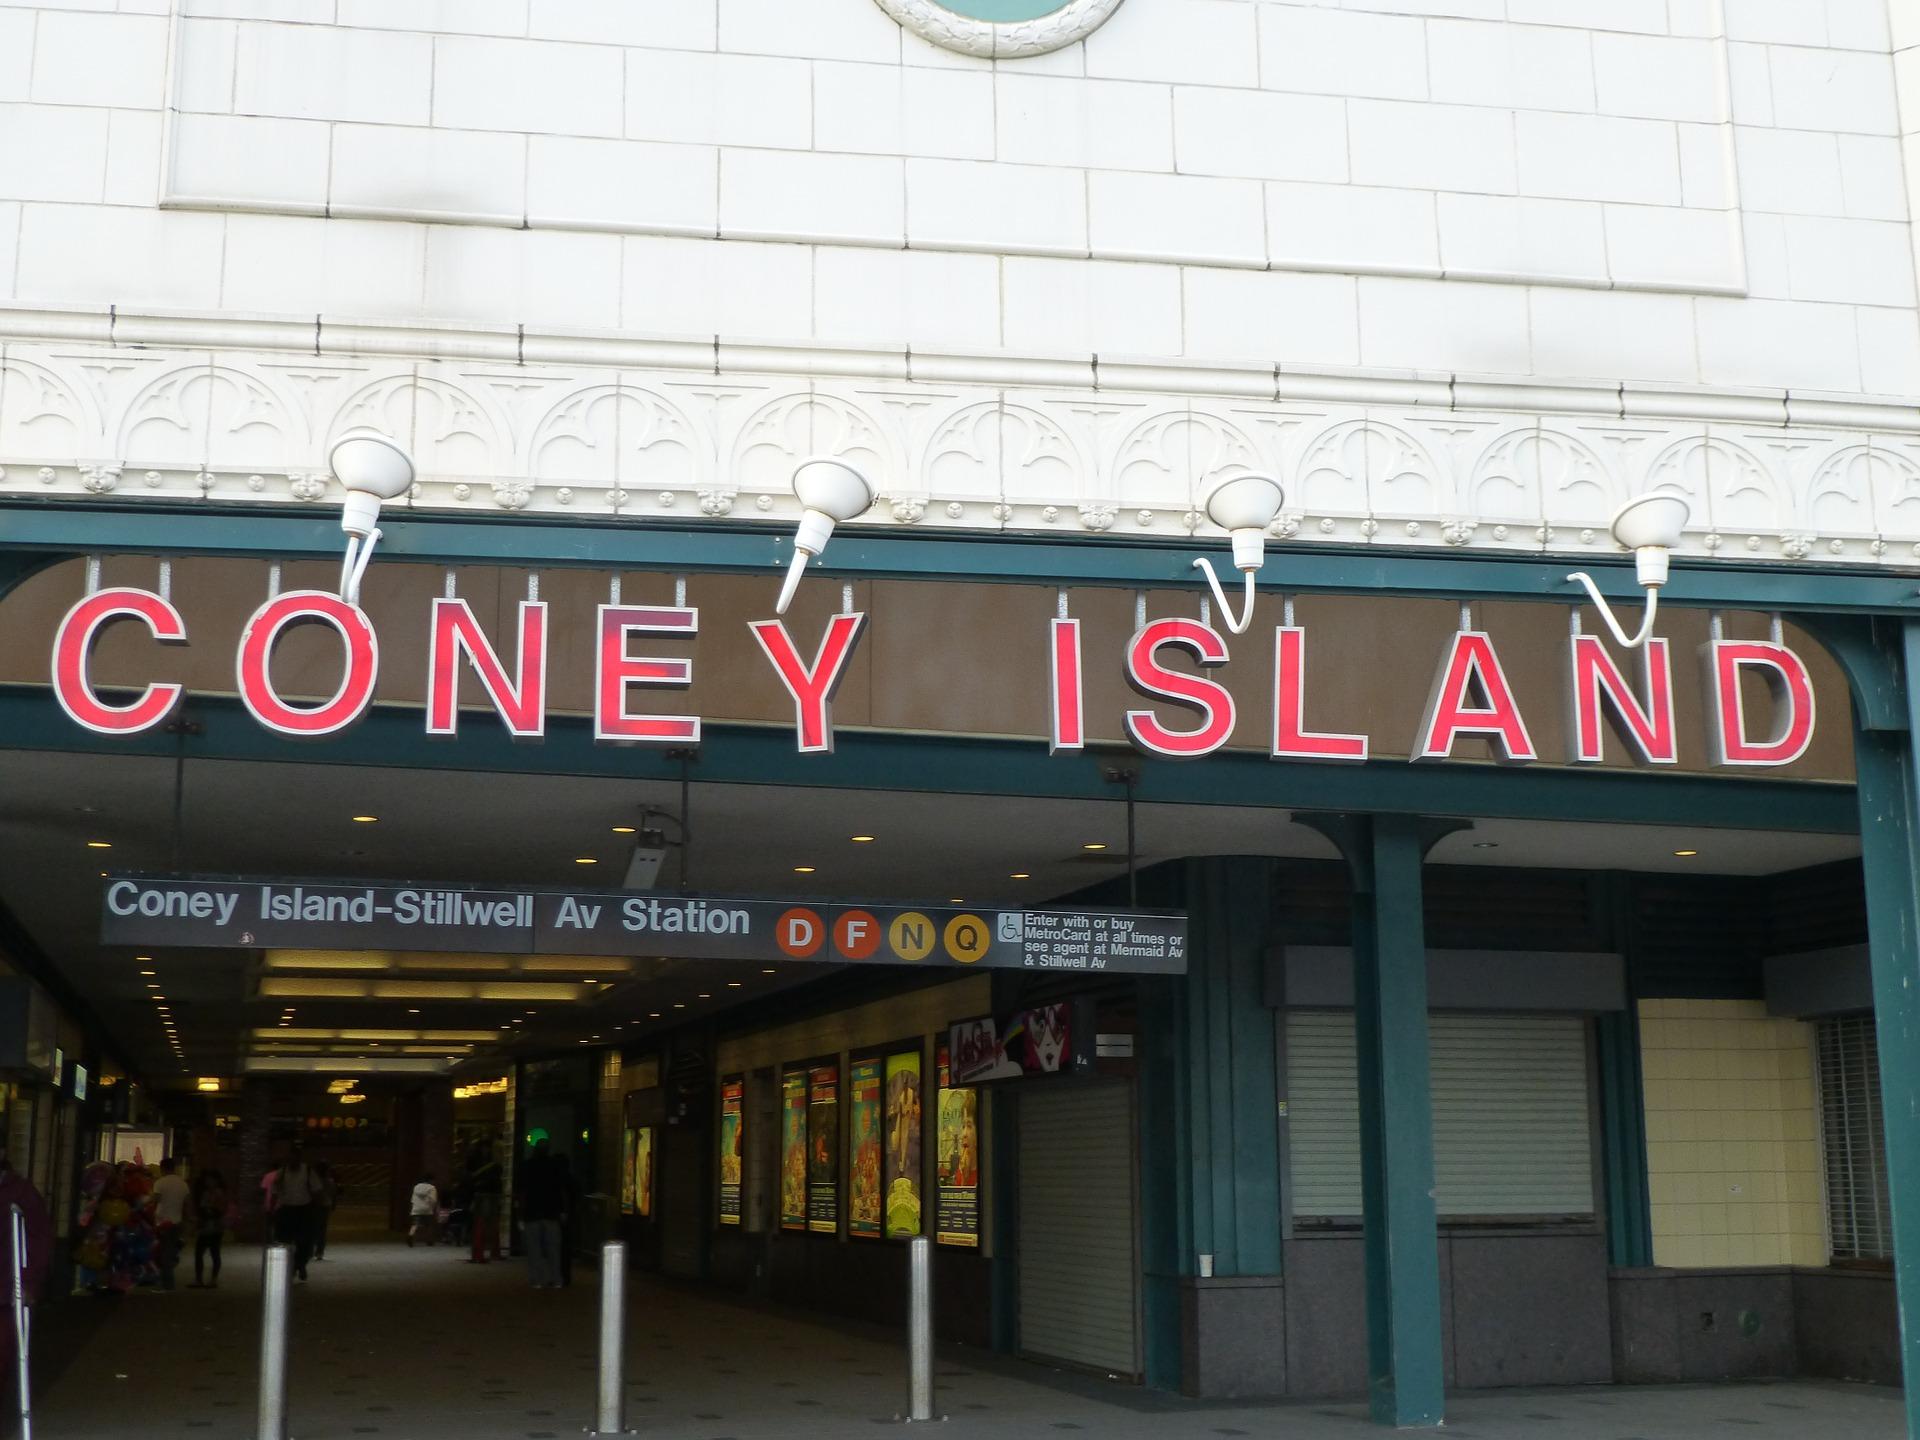 Coney Island Stillwell Avenue Station, New York City